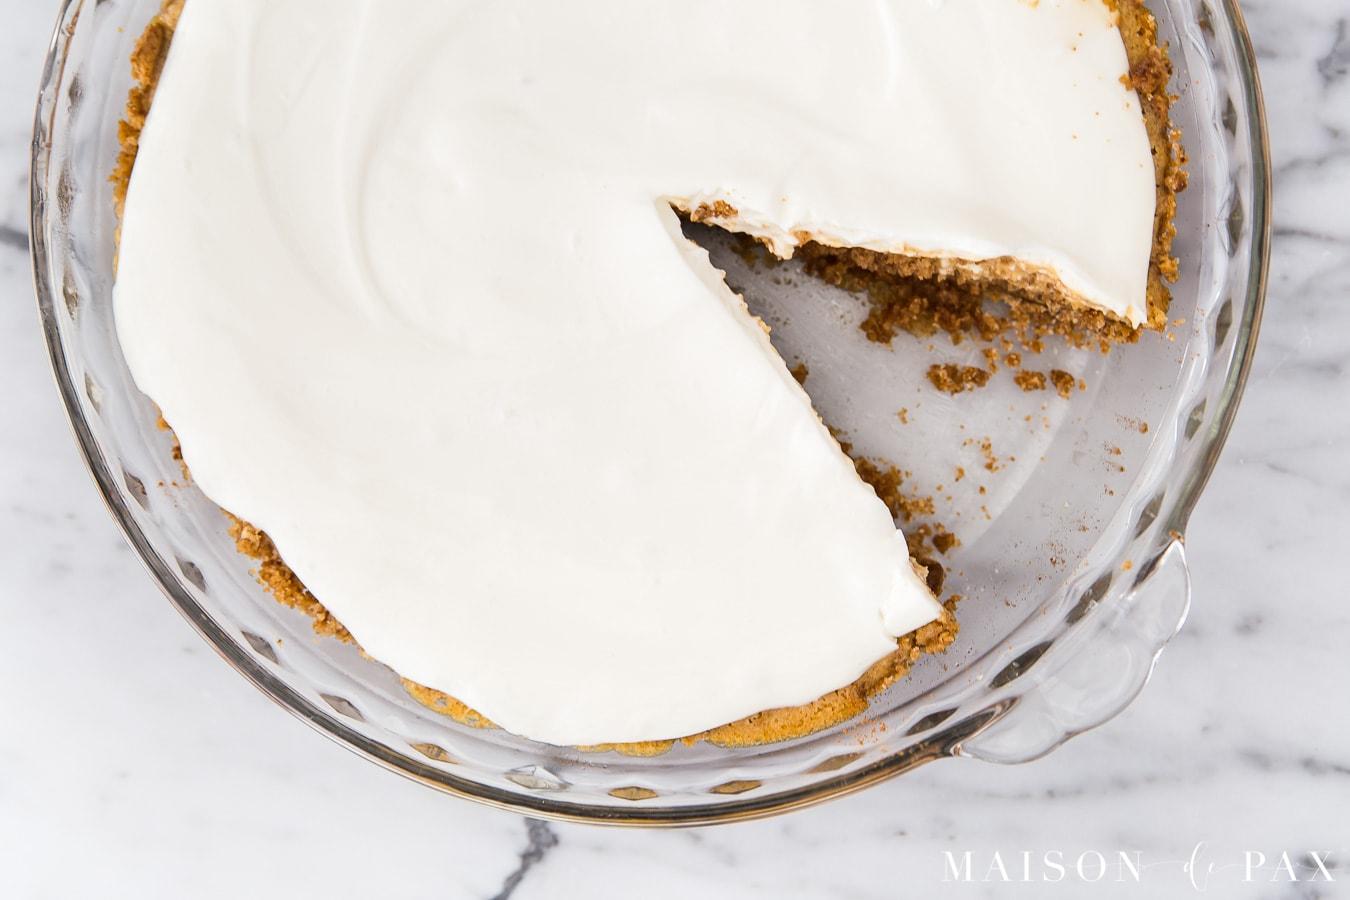 sour cream cheesecake with pumpkin filling | Maison de Pax